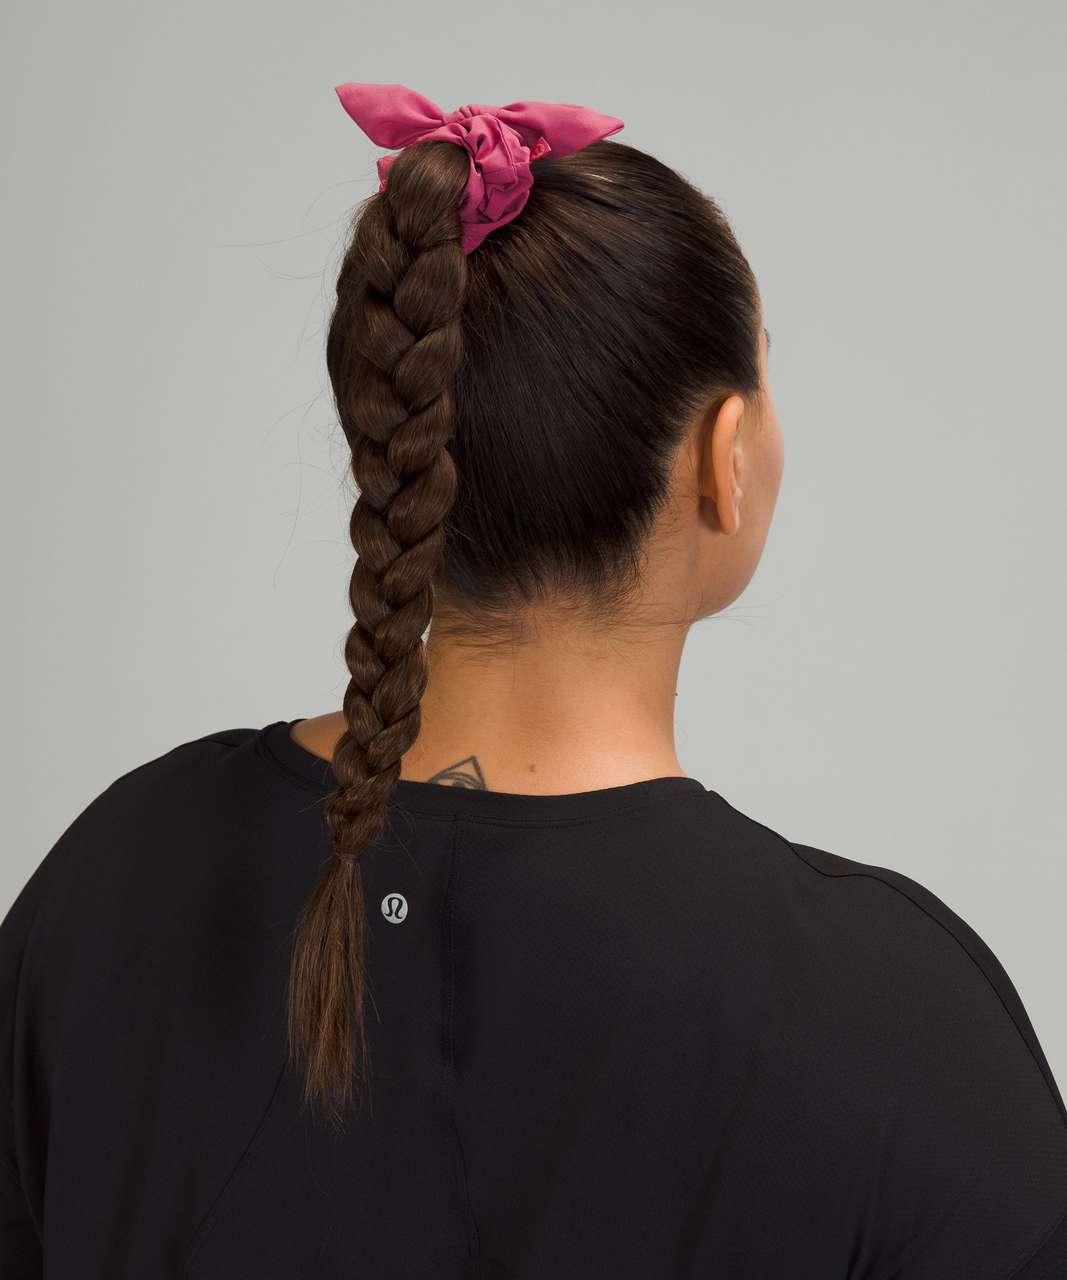 Lululemon Uplifting Scrunchie *Bow - Pink Lychee